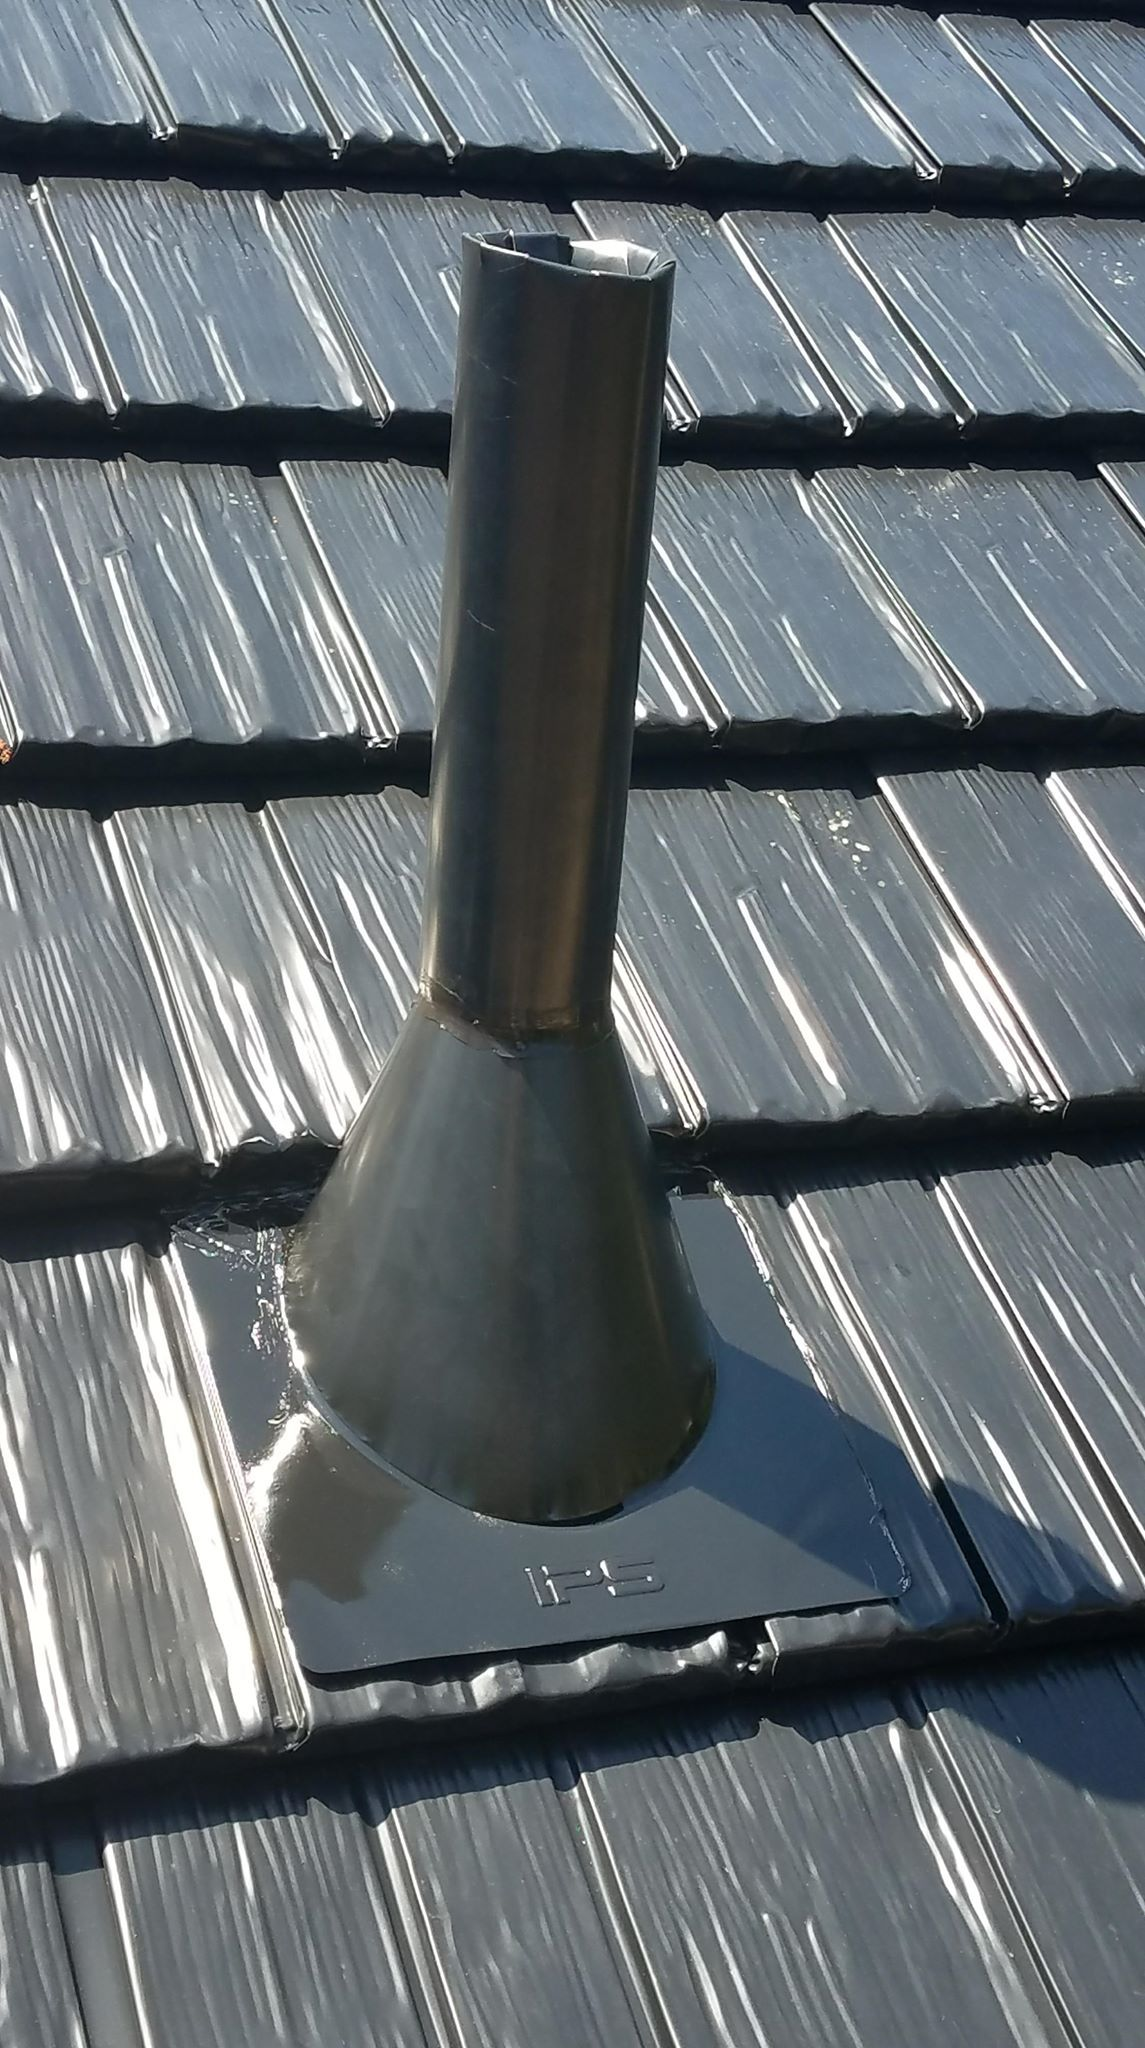 Best Rustic Shake Metal Roof Metal Shingle Roof Metal Shingles 400 x 300